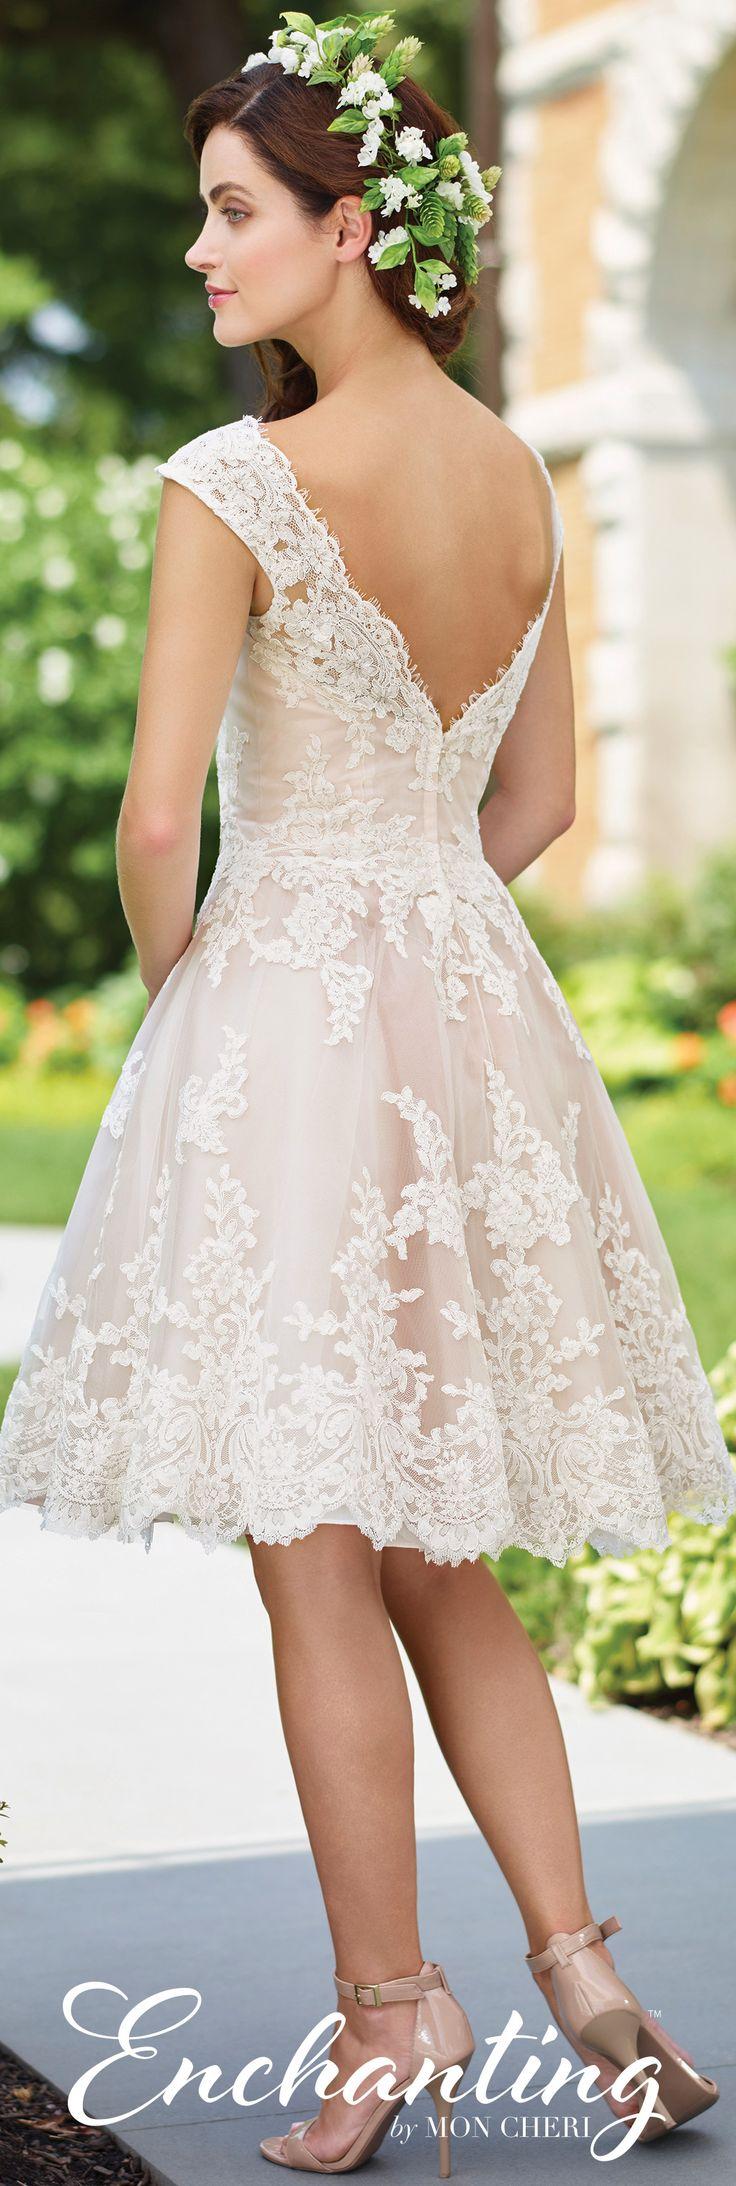 Knee length wedding dress 117185 enchanting by mon cheri for Inexpensive short wedding dresses